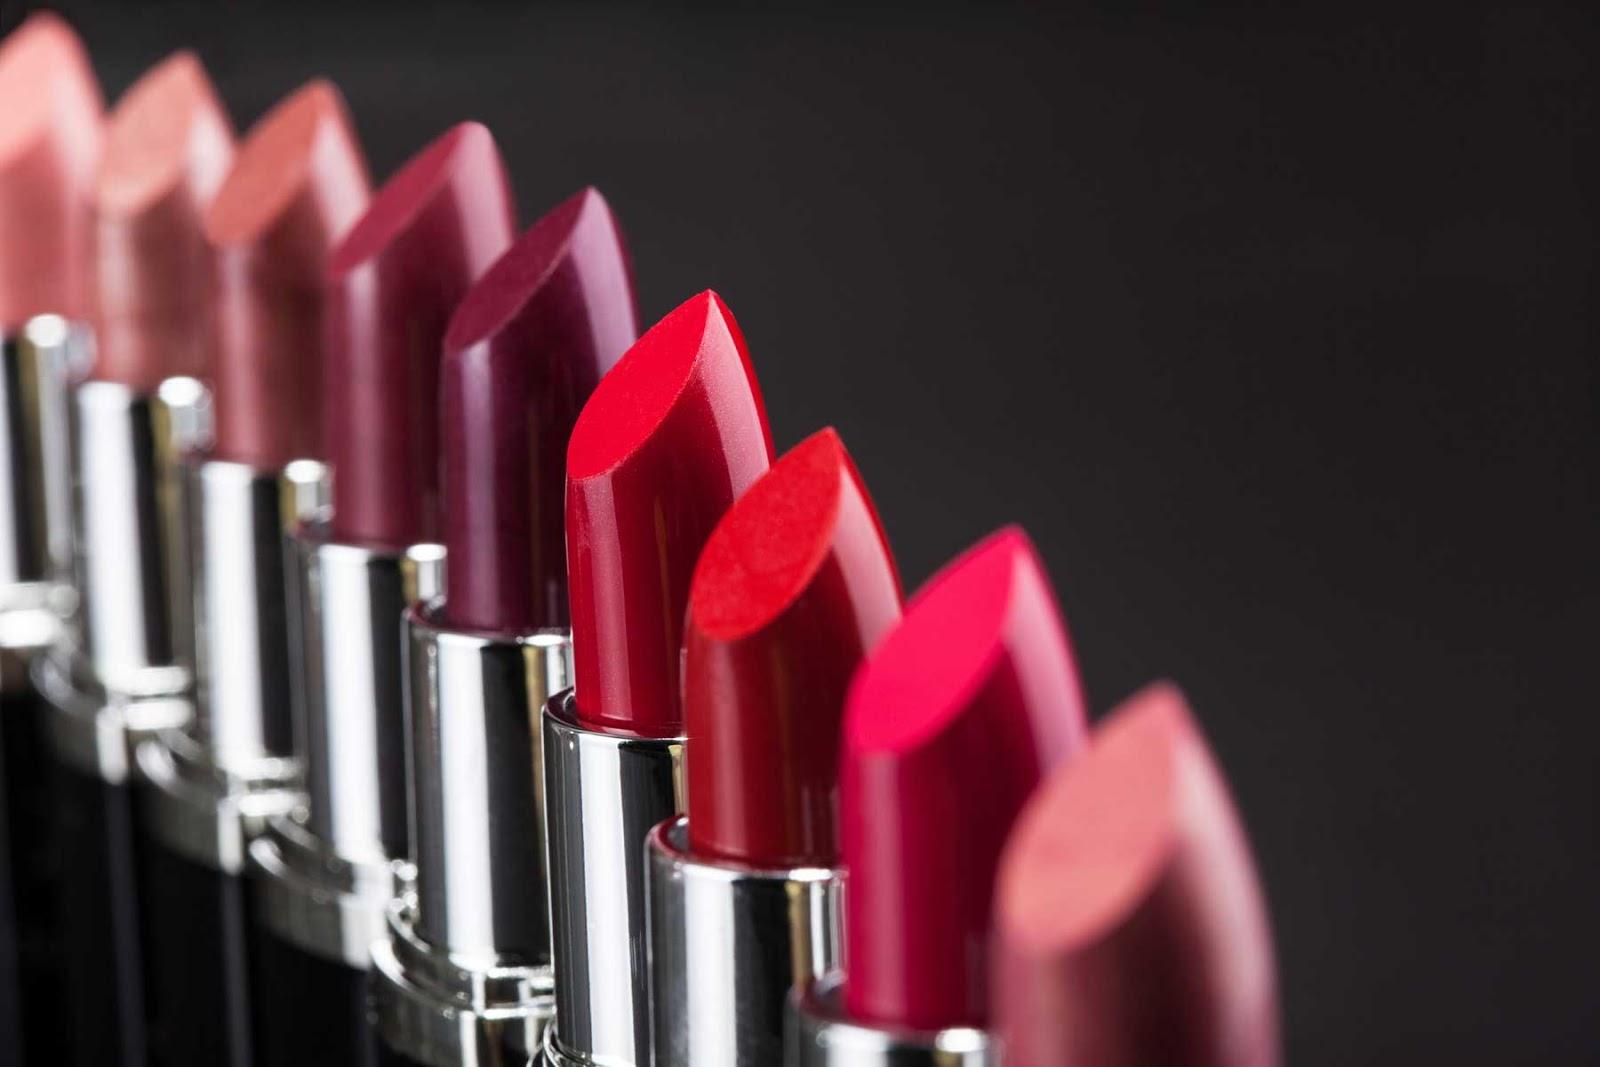 warna lipstik arti makna lipstik produk kosmetik kecantikan makeup artist mua bibir beauty blogger vlogger indonesia review merek merk brand branded tips cara memakai yang benar jenis macam manfaat kegunaan